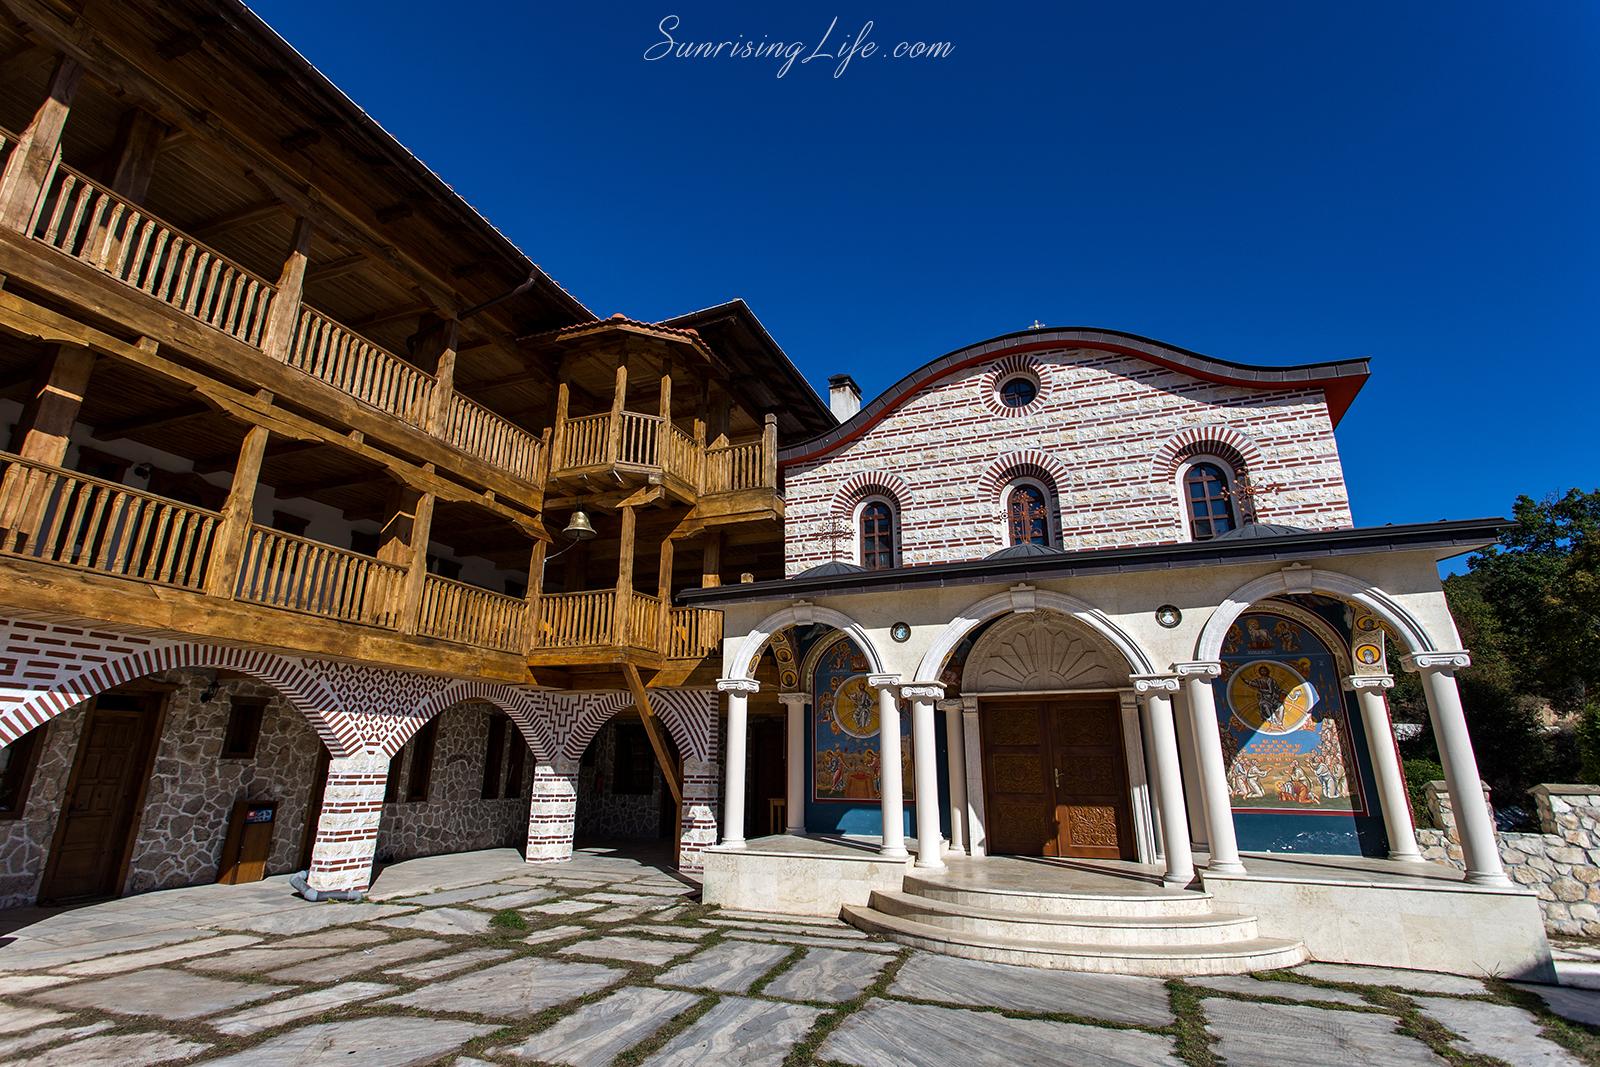 Giginski monastery